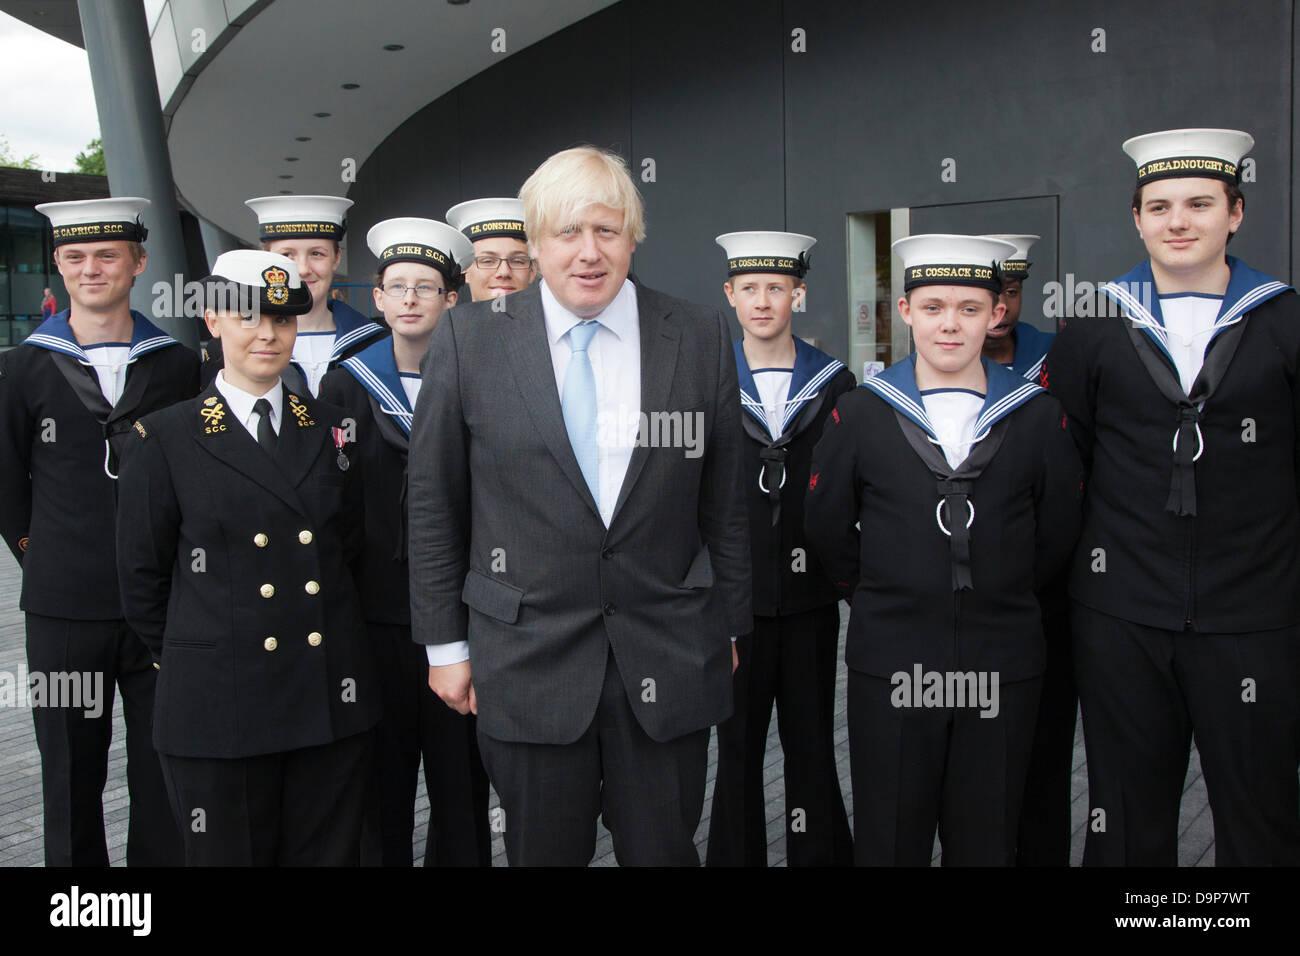 London, UK. 24 June 2013. Pictured: Boris Johnson with Sea Cadets. The Mayor of London, Boris Johnson, was today - Stock Image